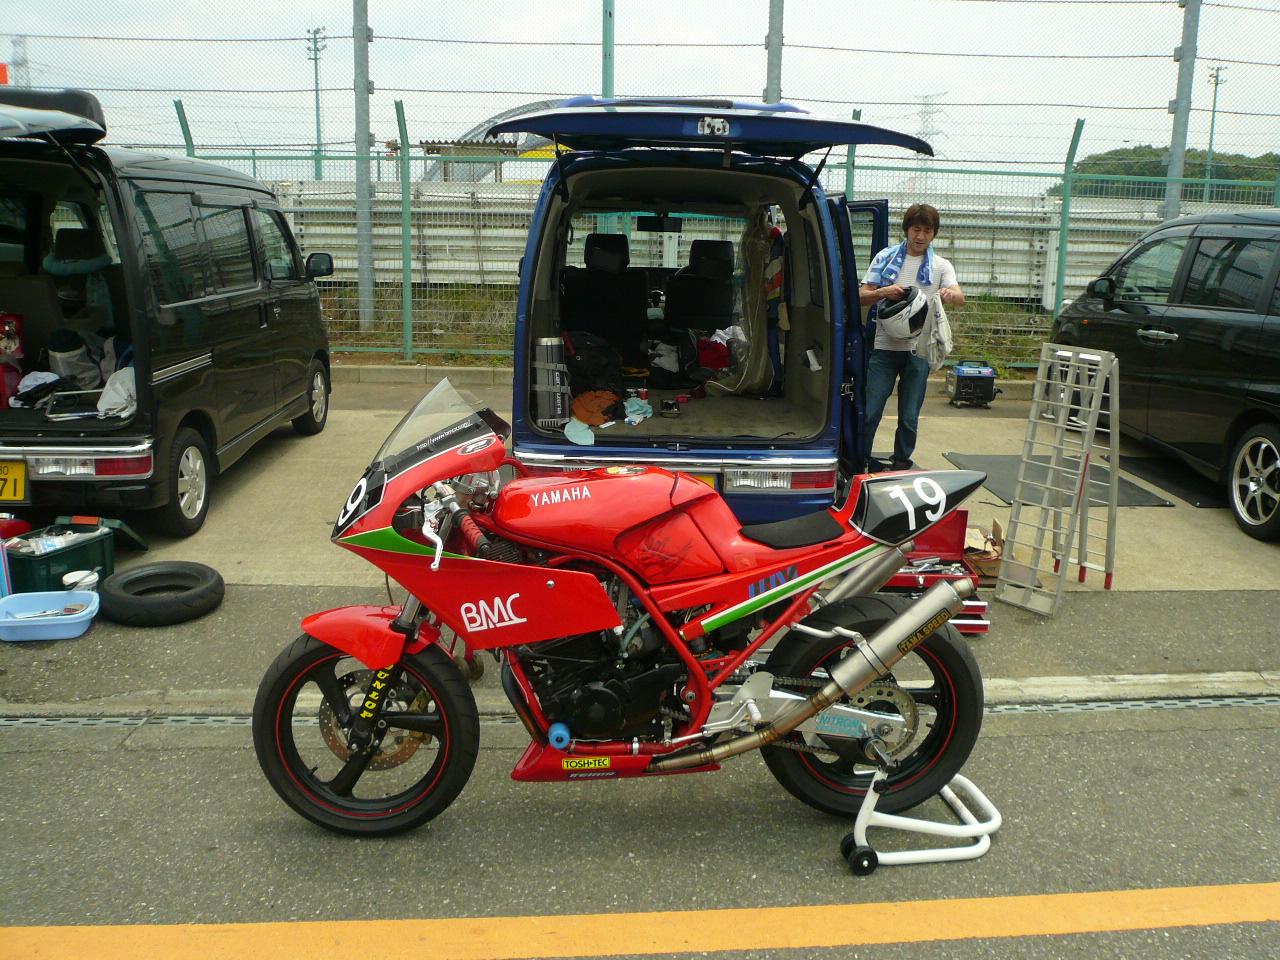 http://img.blogs.yahoo.co.jp/ybi/1/13/f5/tetsutaro499/folder/420383/img_420383_48139290_2?1243879277